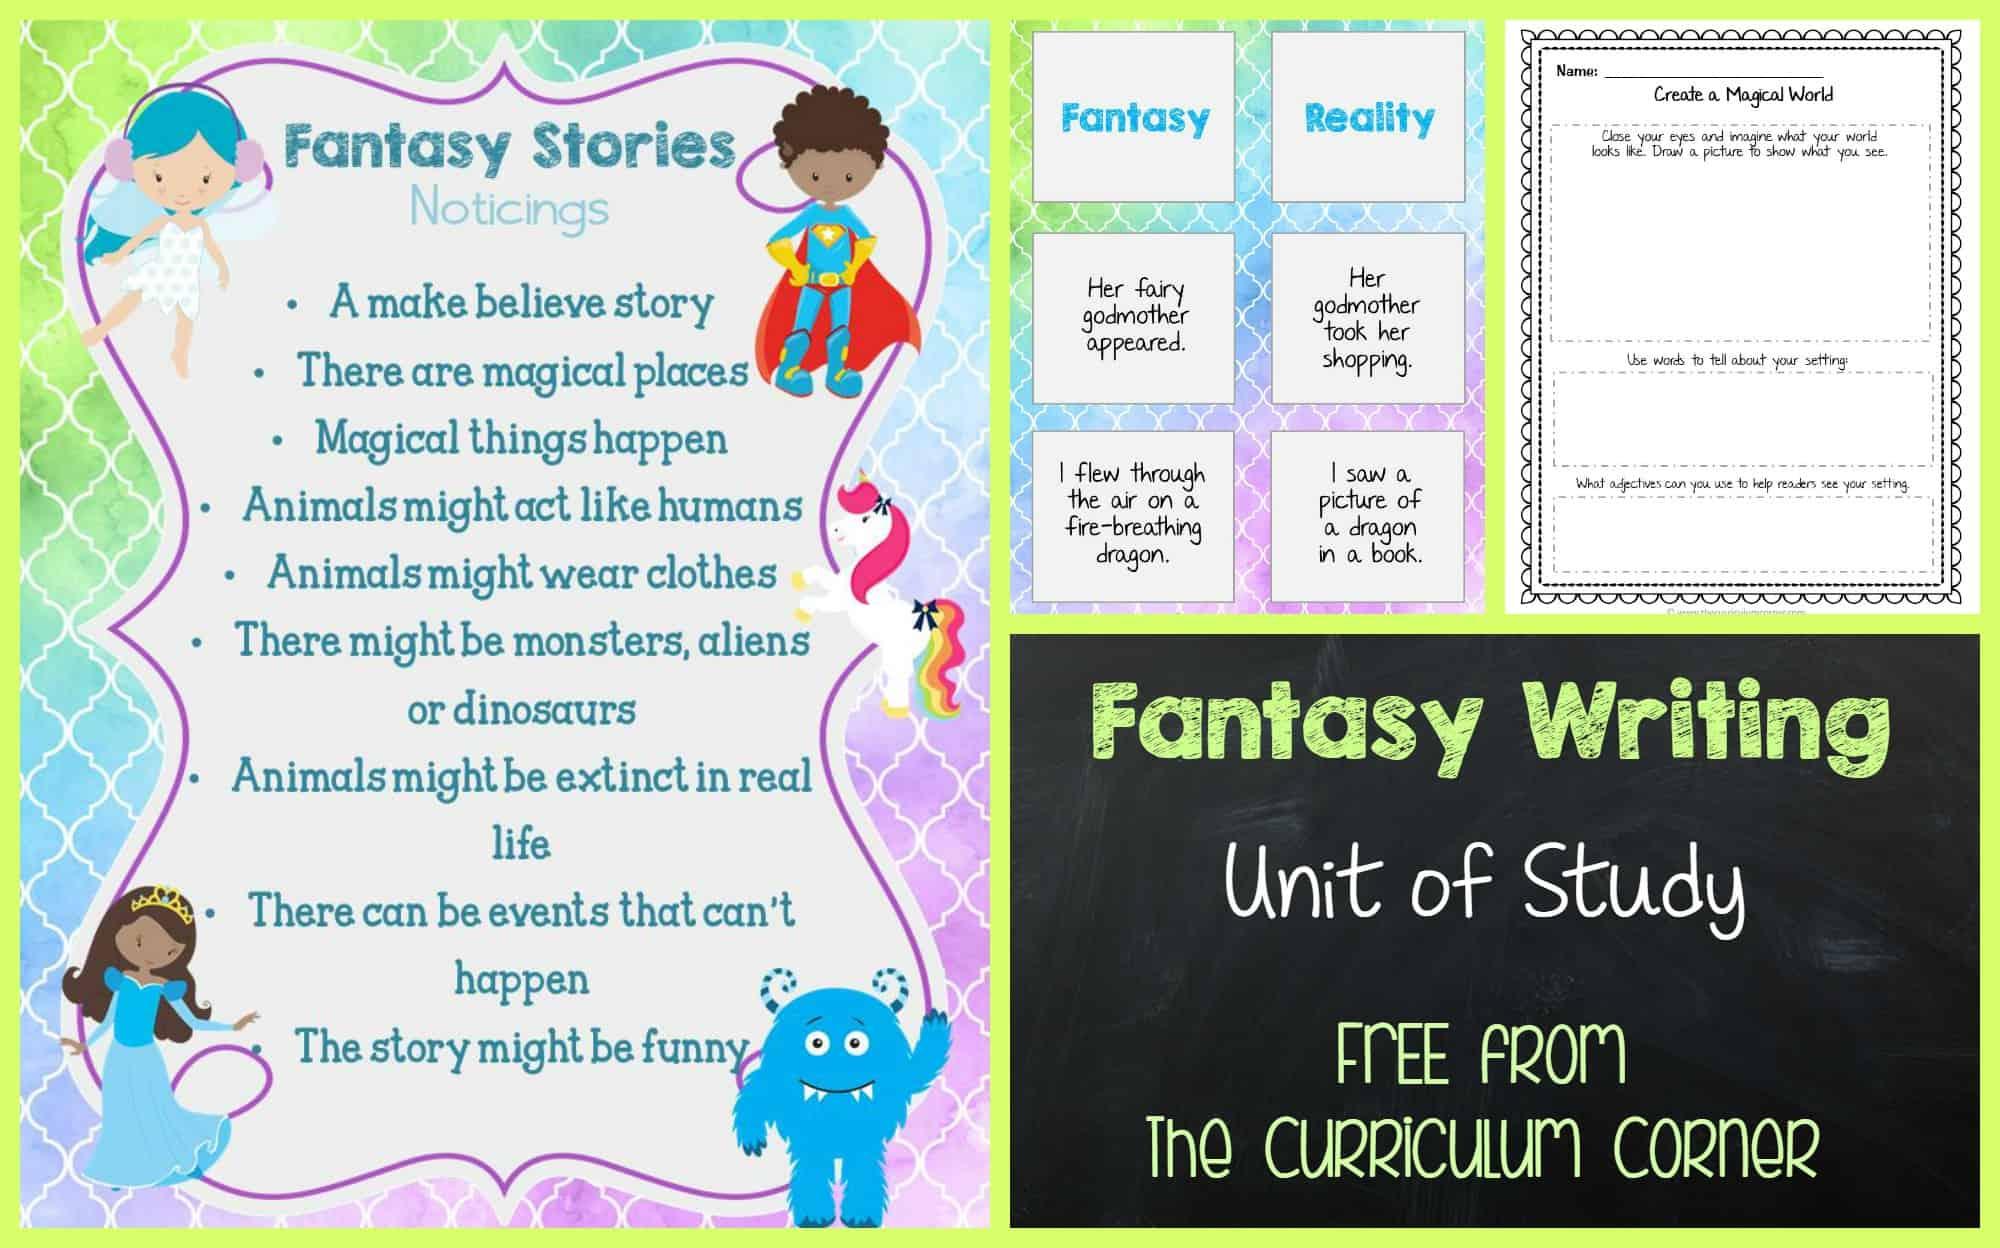 fantasy writing unit of study